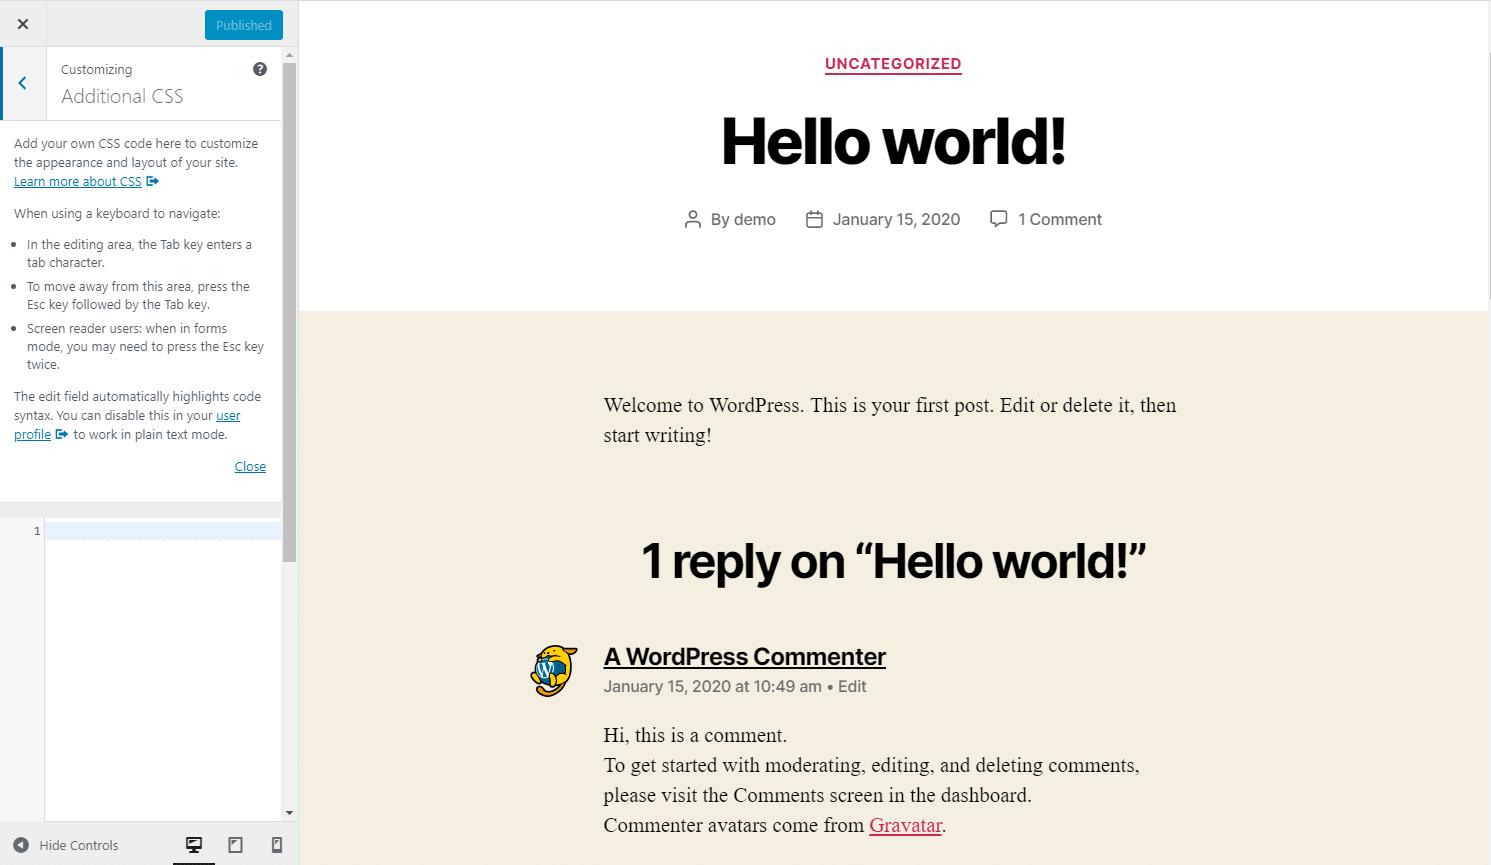 CSS aggiuntivo in WordPress